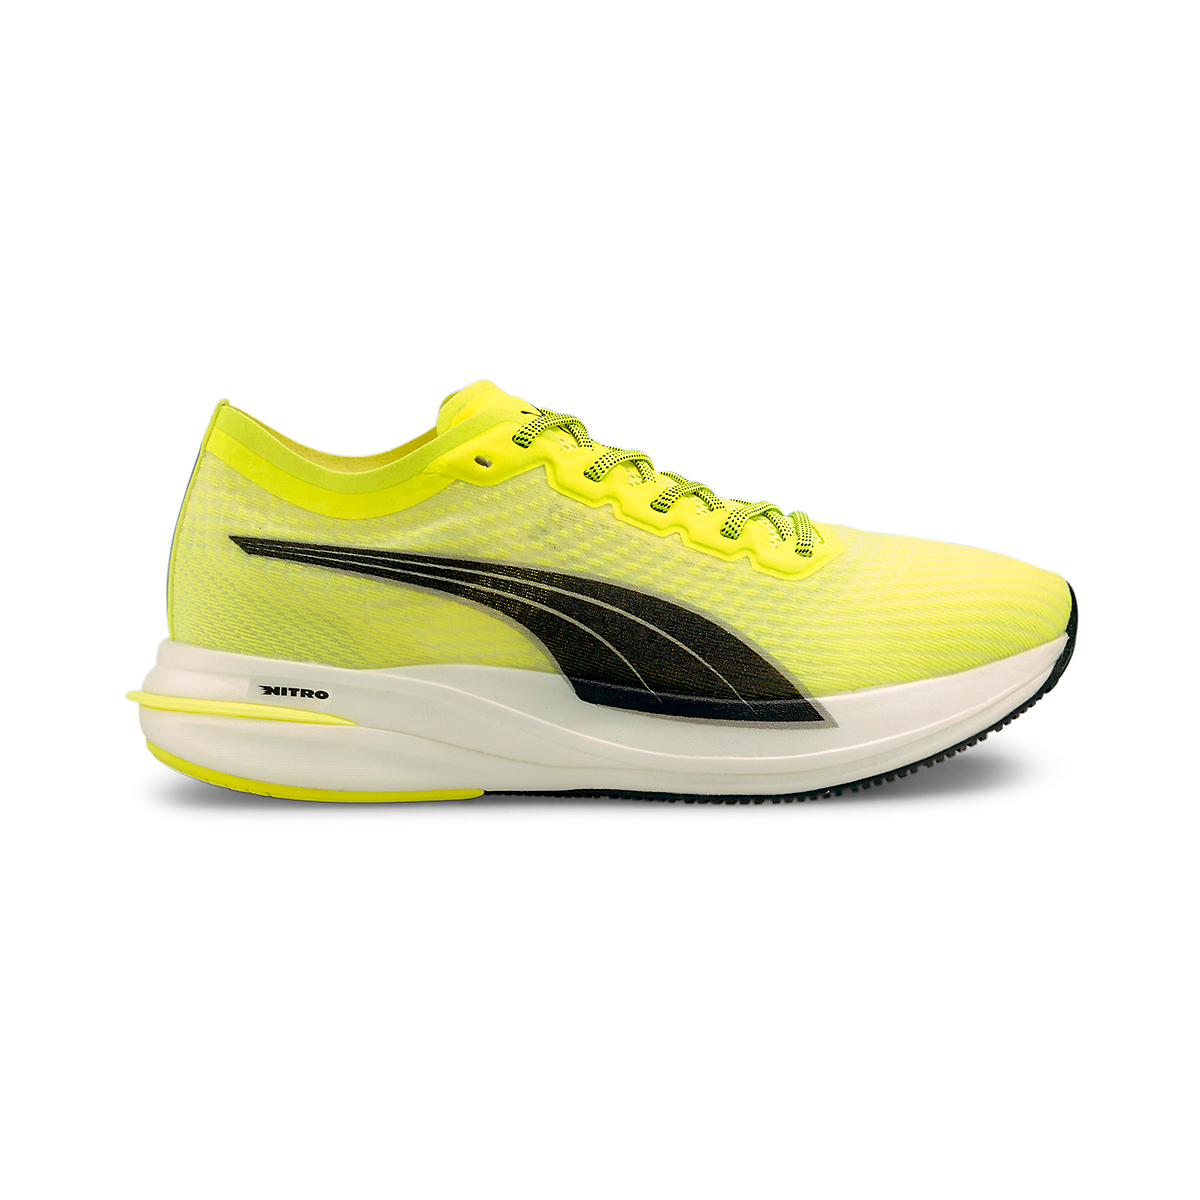 Men's Puma Deviate Nitro Running Shoe - Color: Yellow Alert - Size: 7 - Width: Regular, Yellow Alert, large, image 1